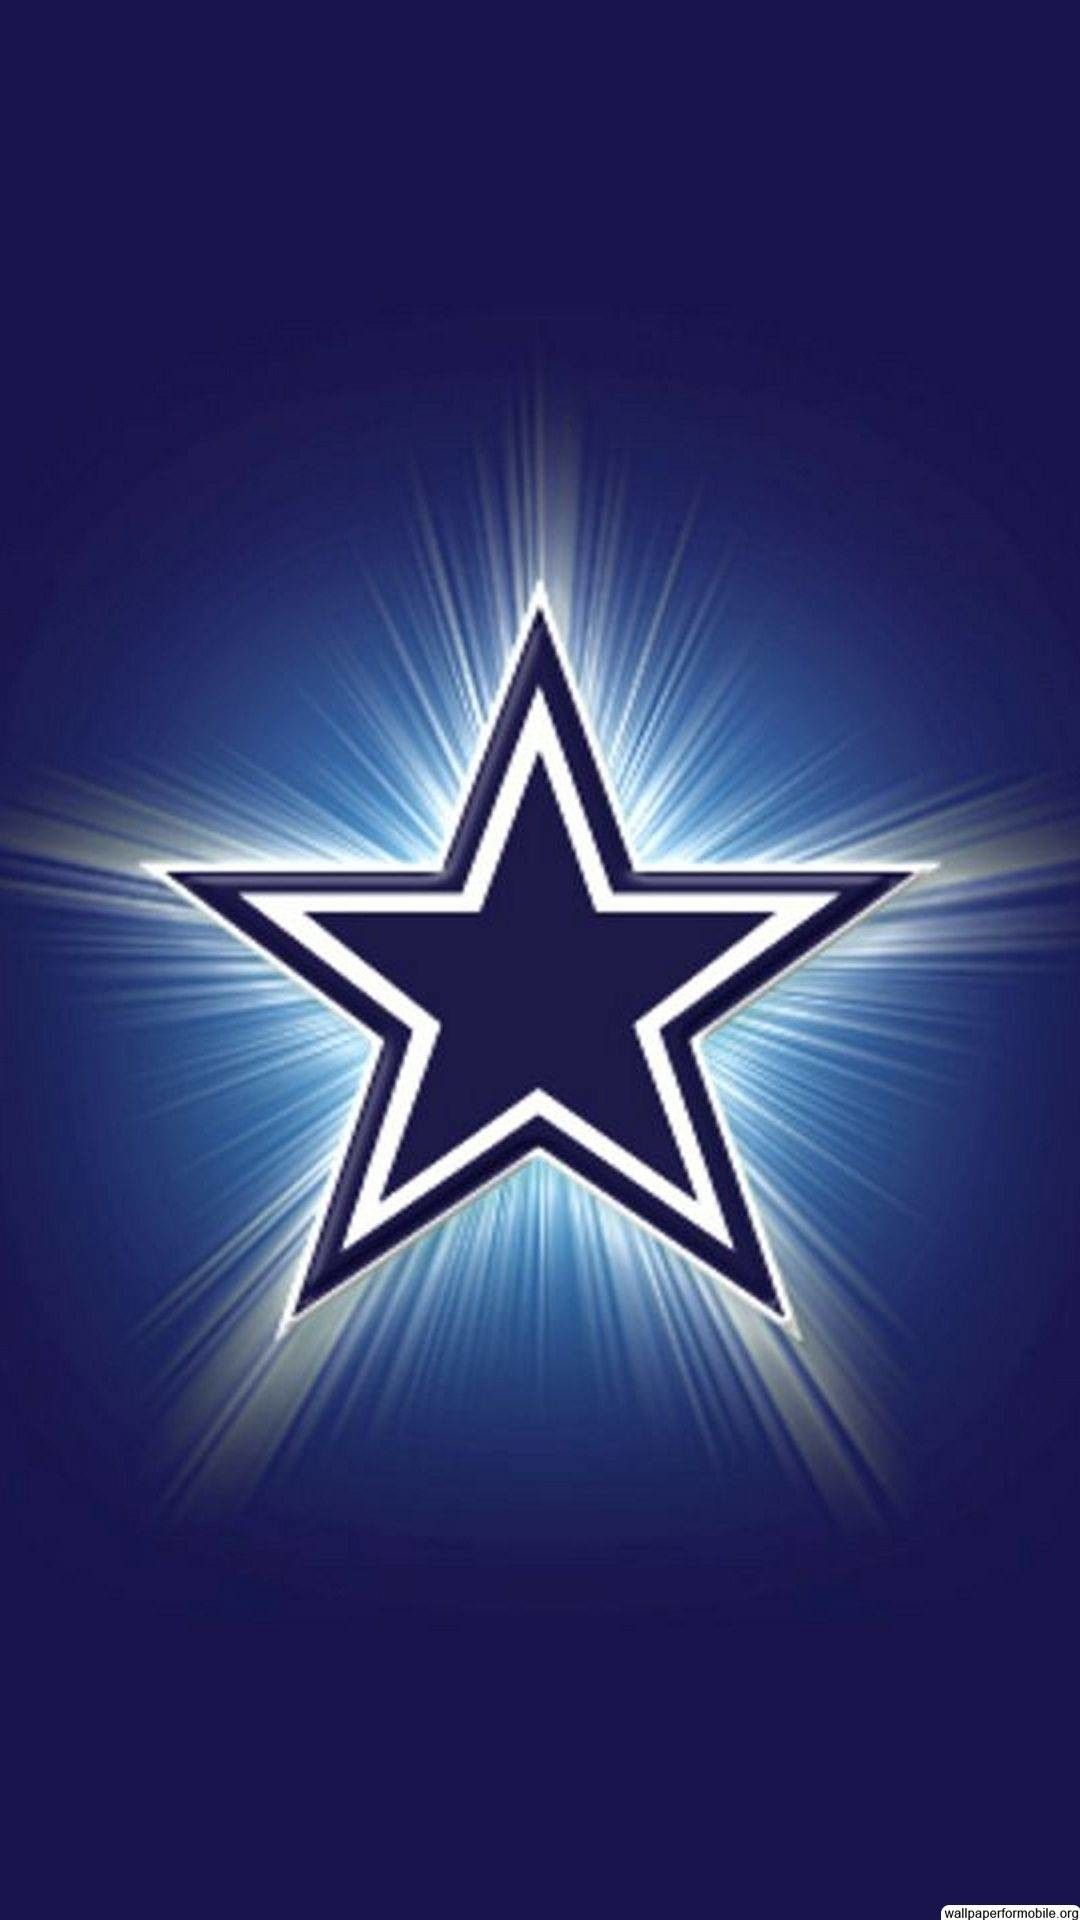 Ezekiel Elliott Dallas Cowboys Hd Wallpaper Android